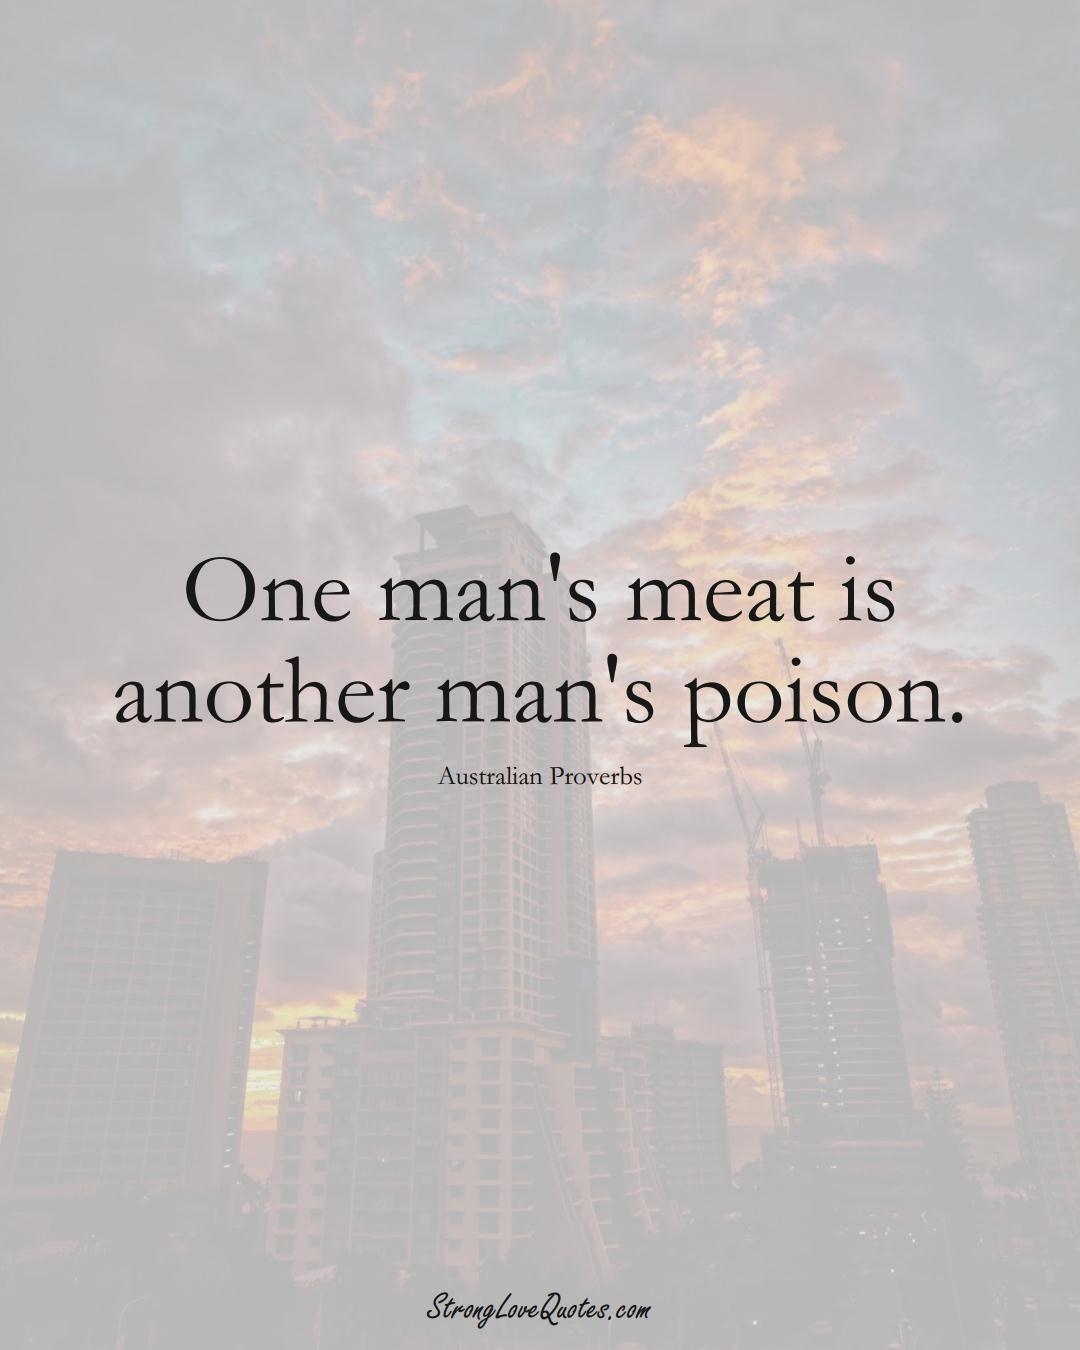 One man's meat is another man's poison. (Australian Sayings);  #AustralianSayings